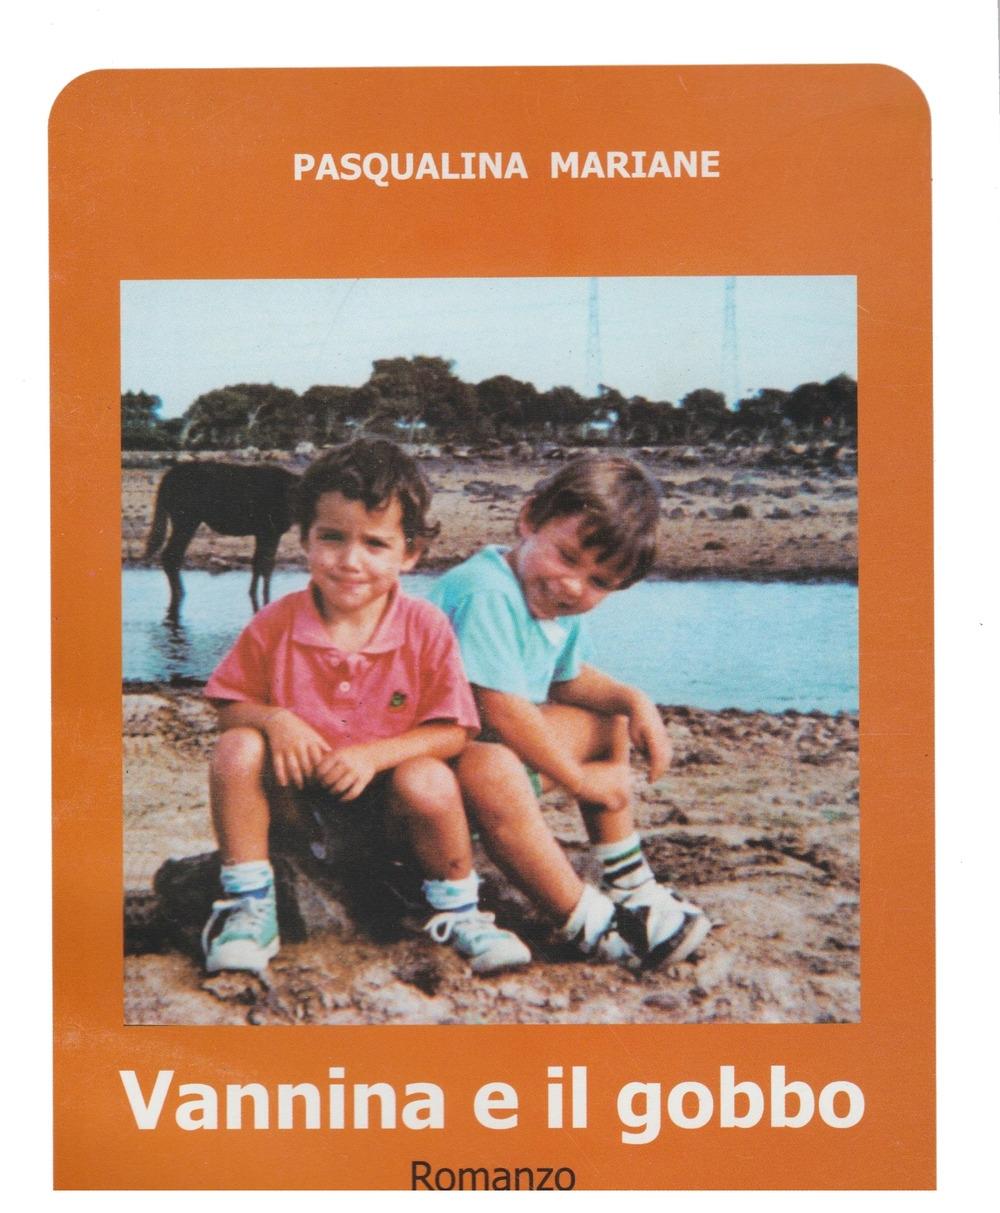 Vannina e il gobbo